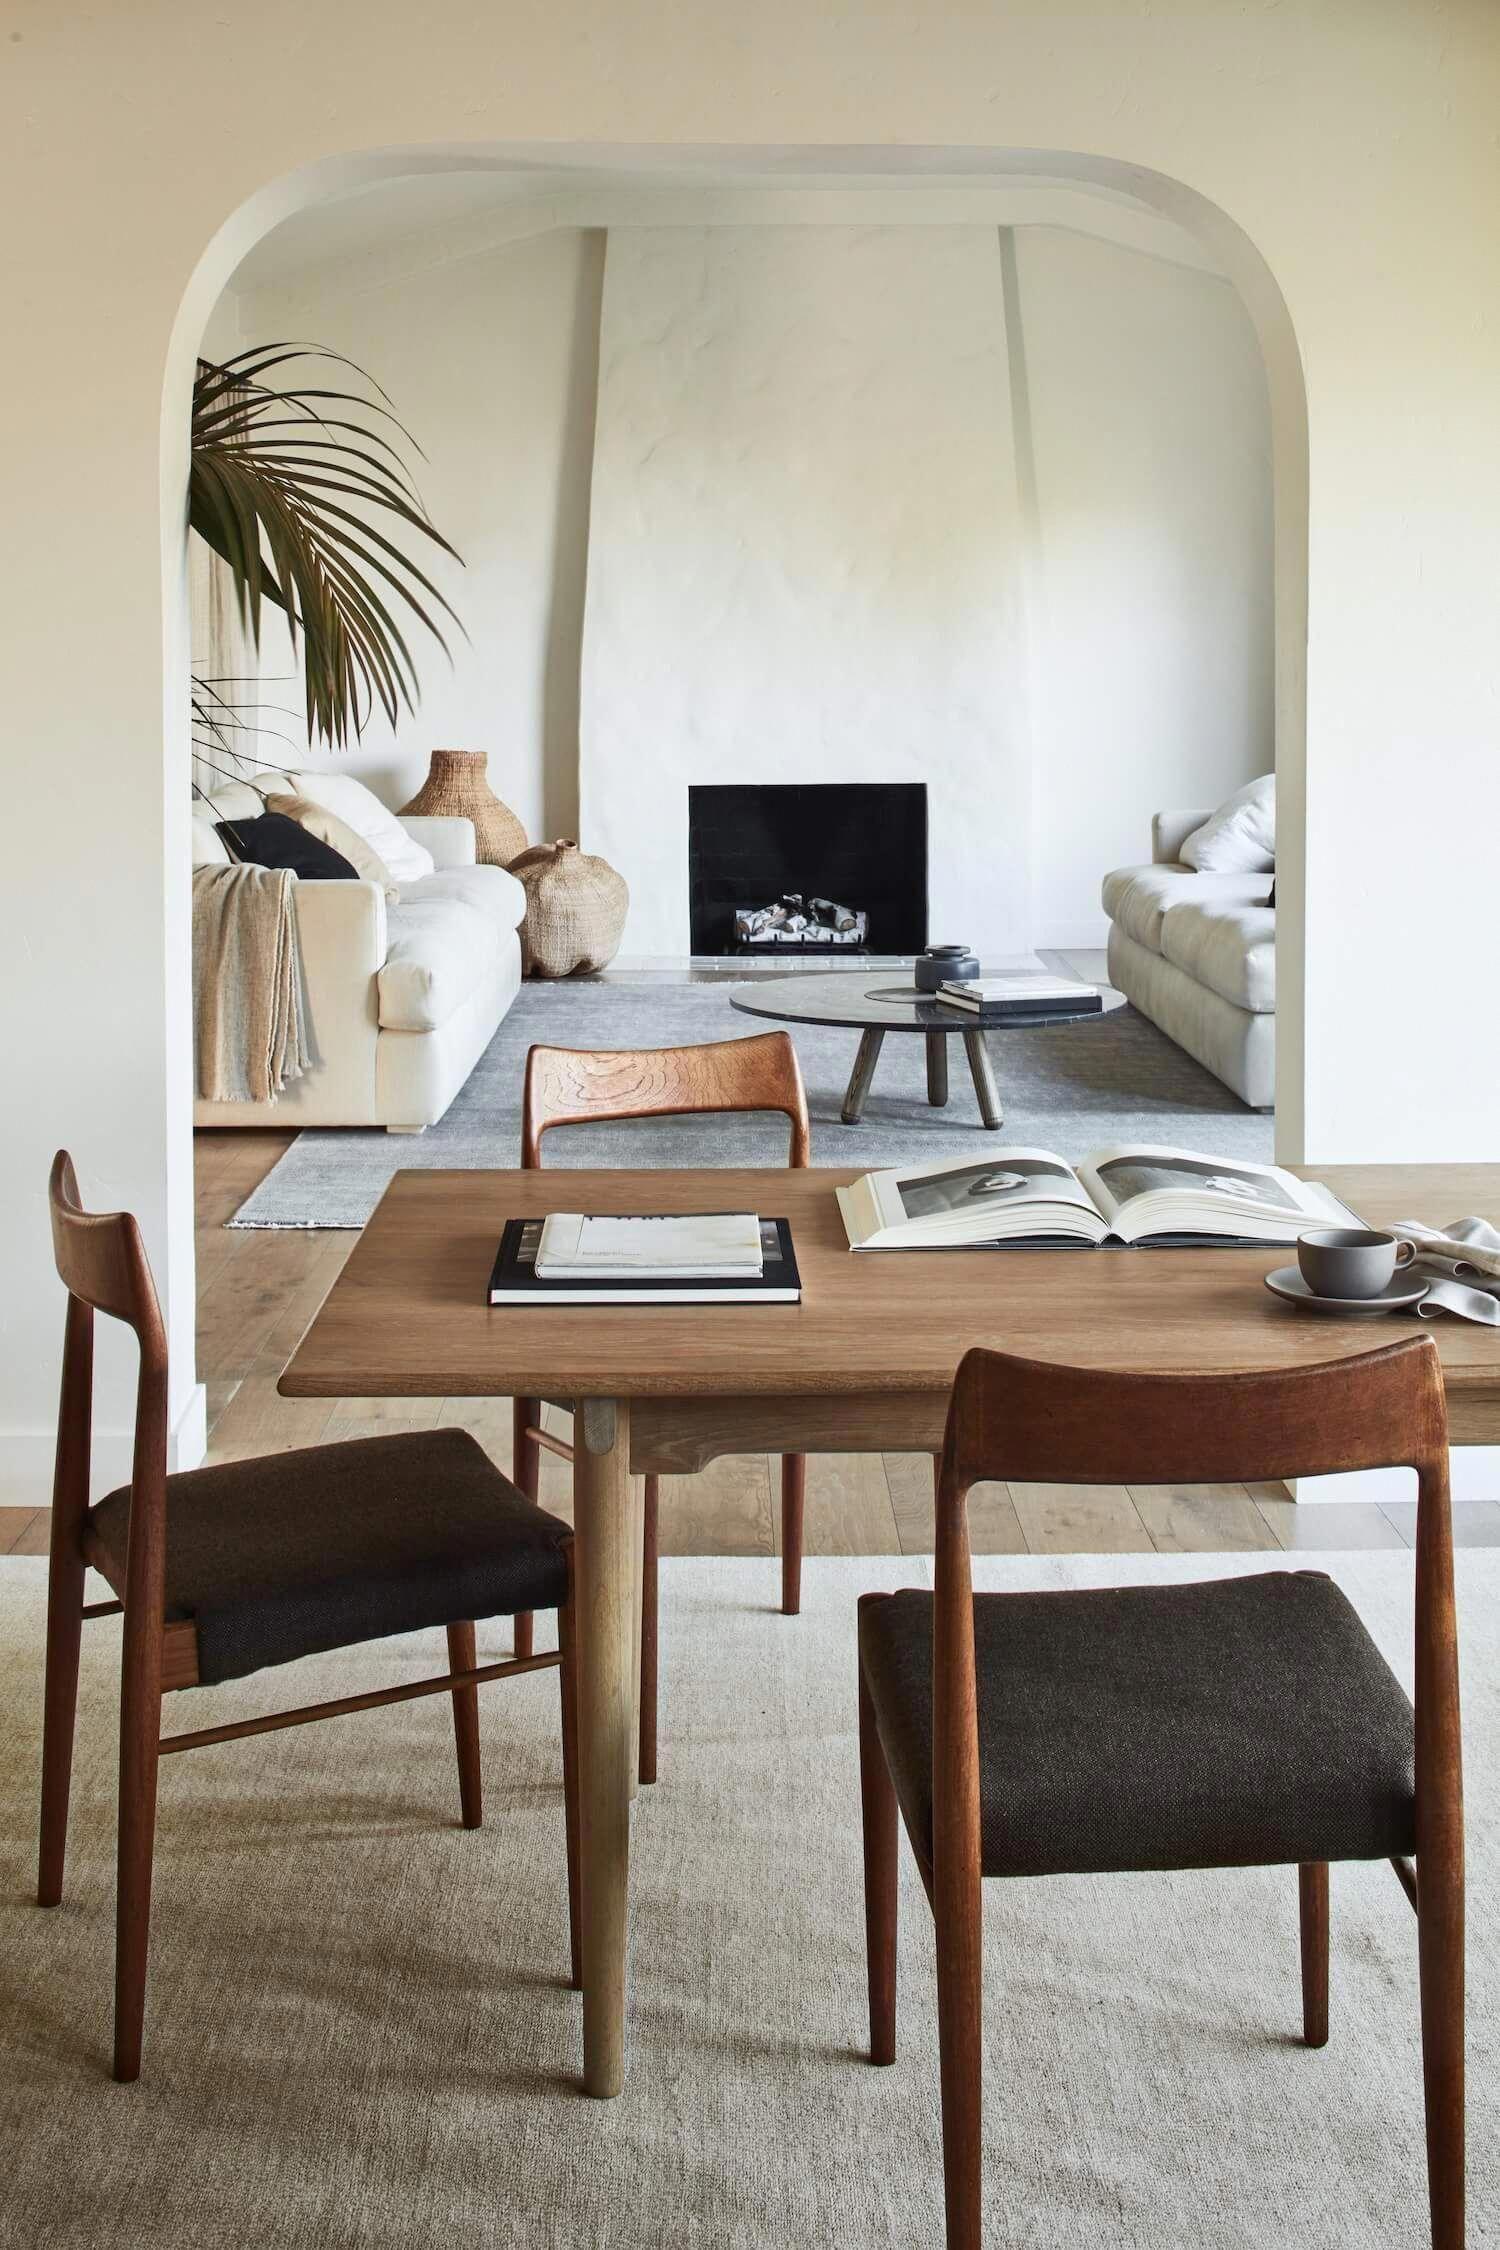 Interior design for living room homedecorationideas code also rh pinterest